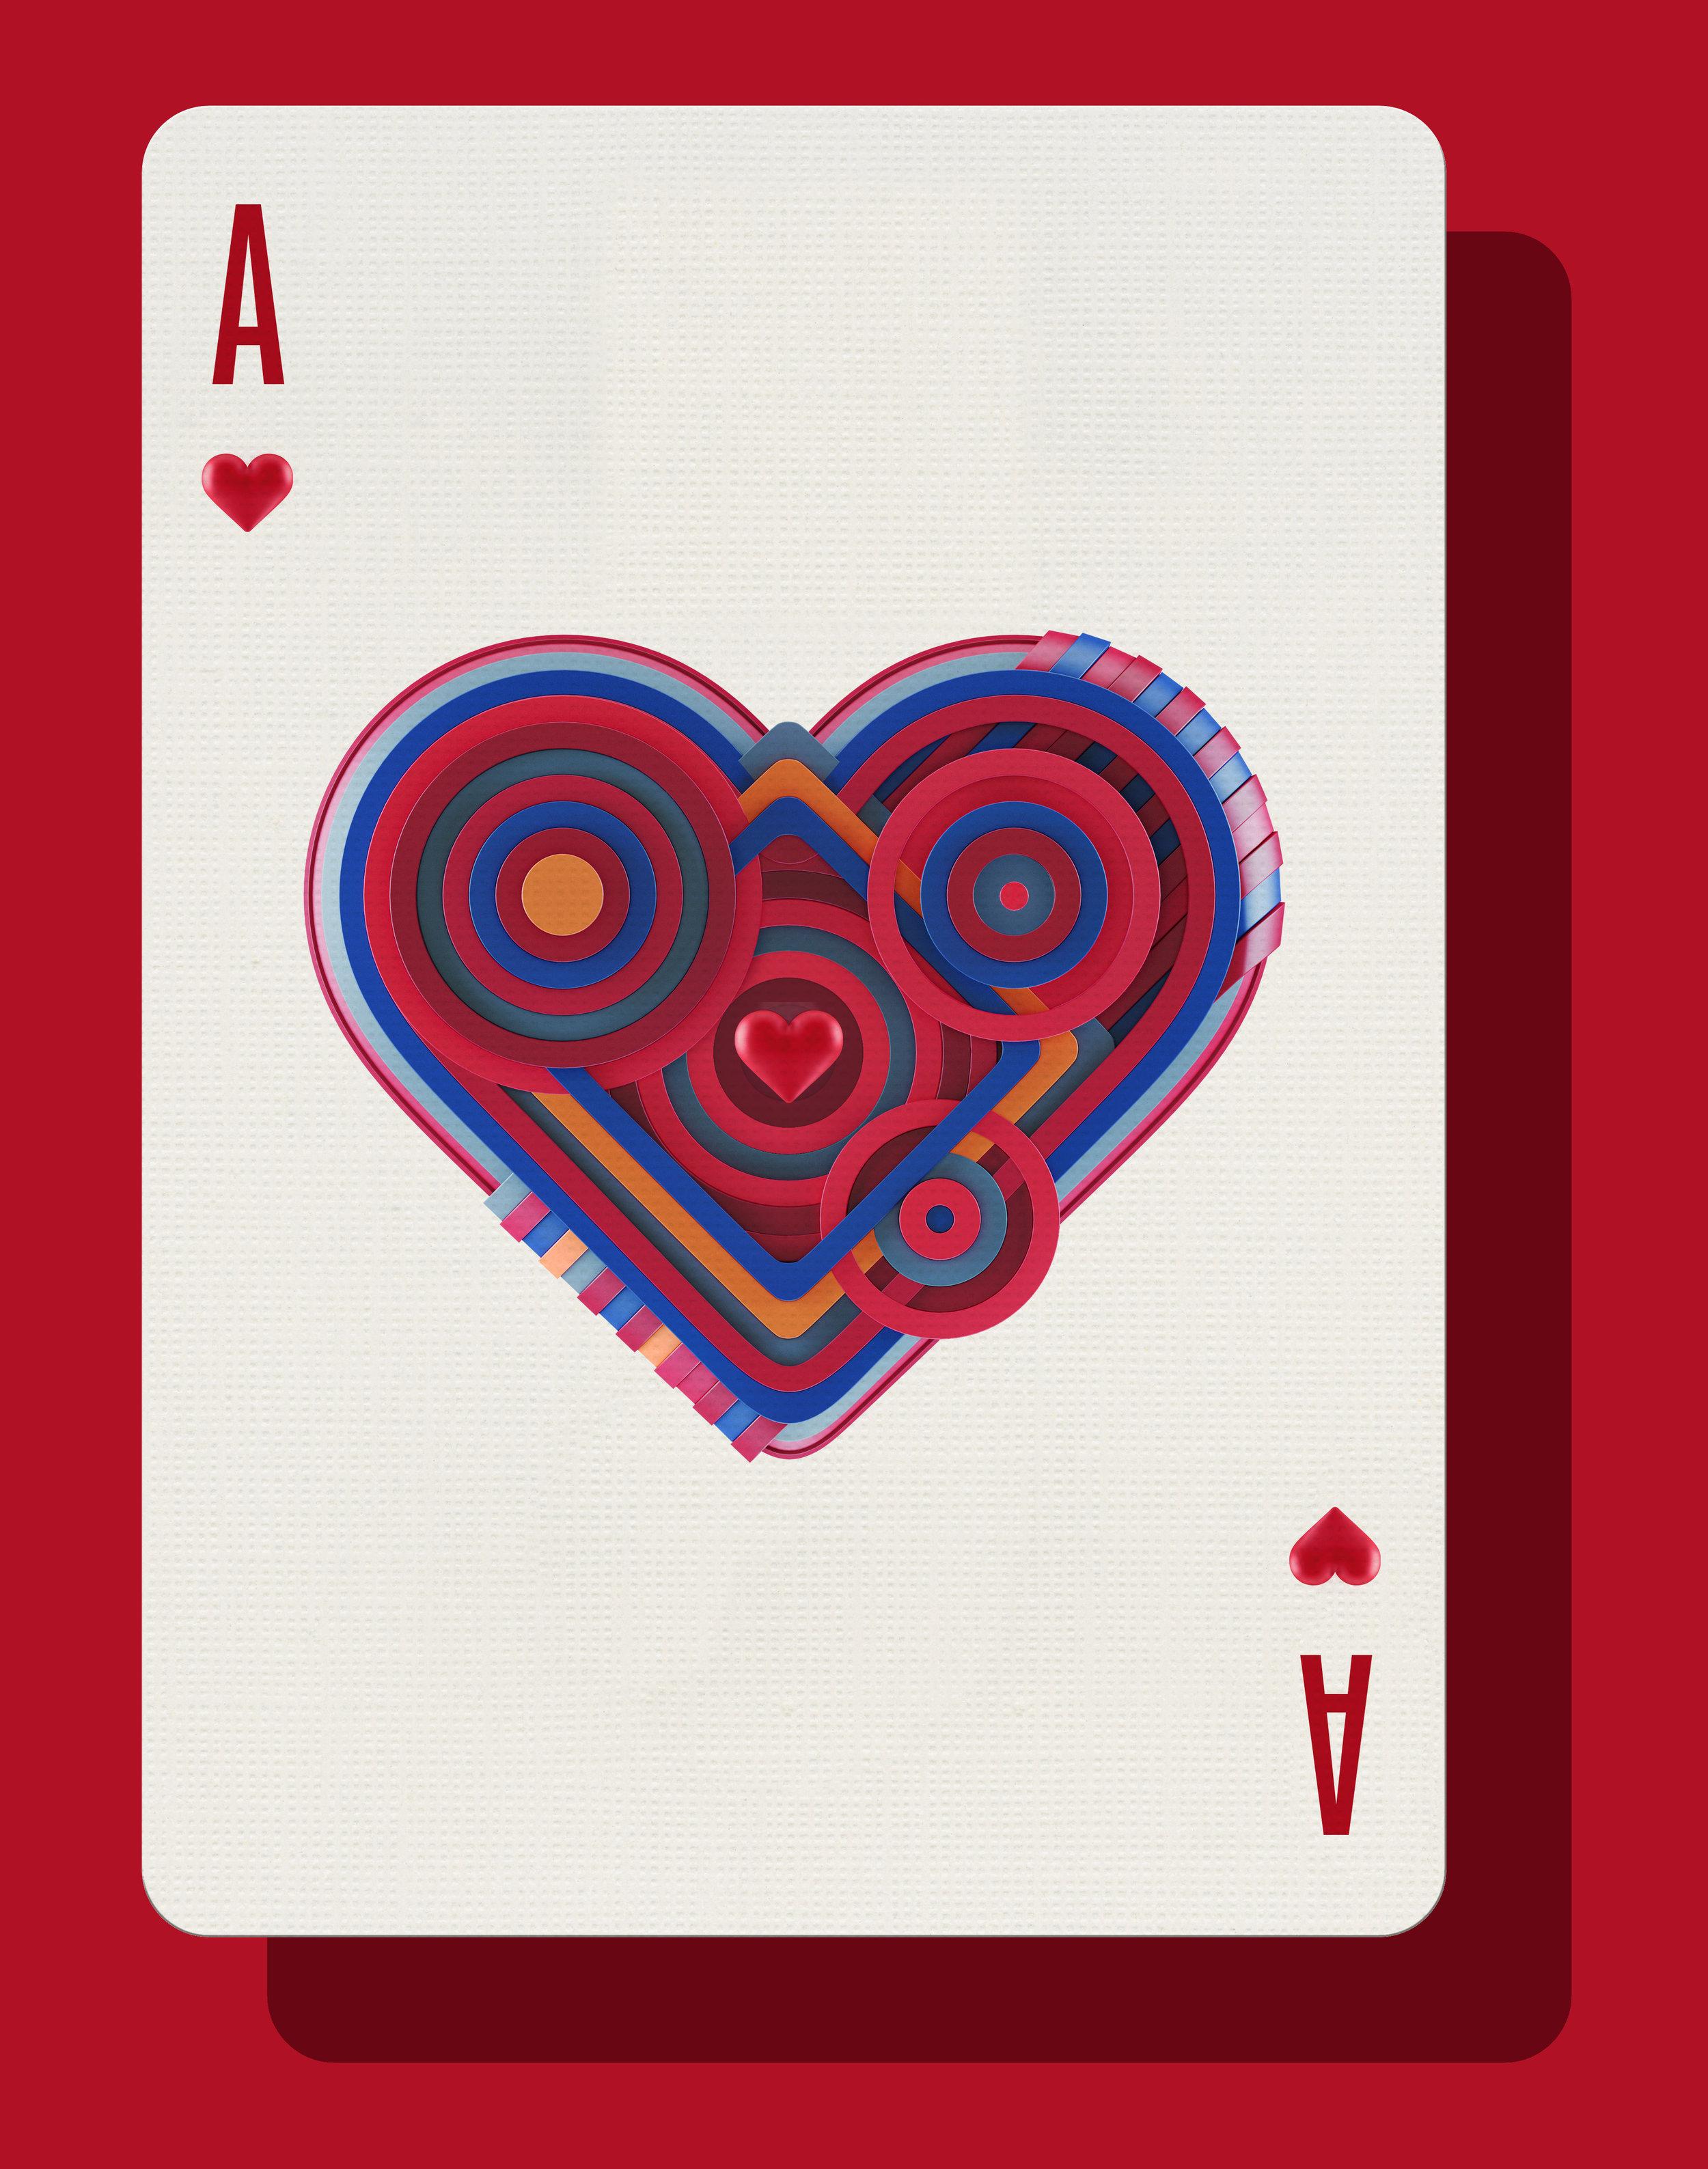 ACE_hearts.jpg